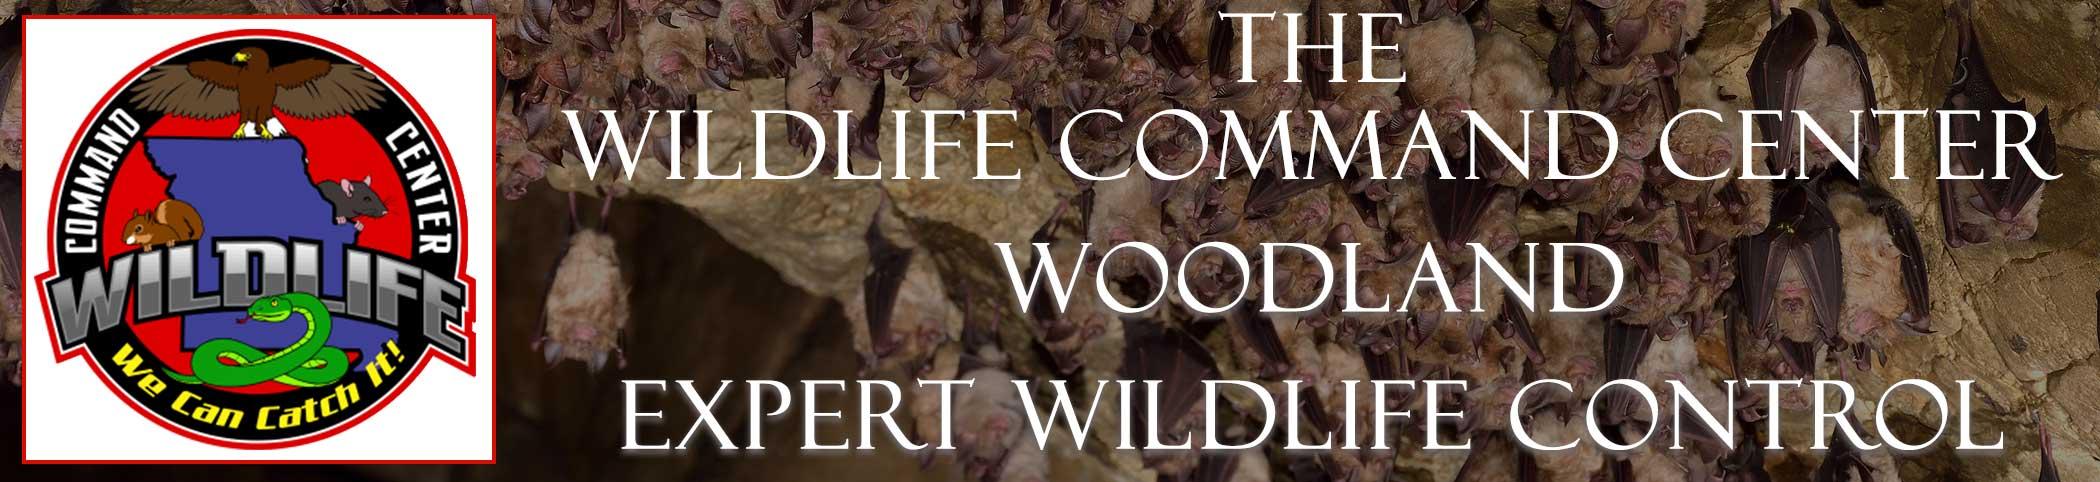 woodland-wildlife-command-center